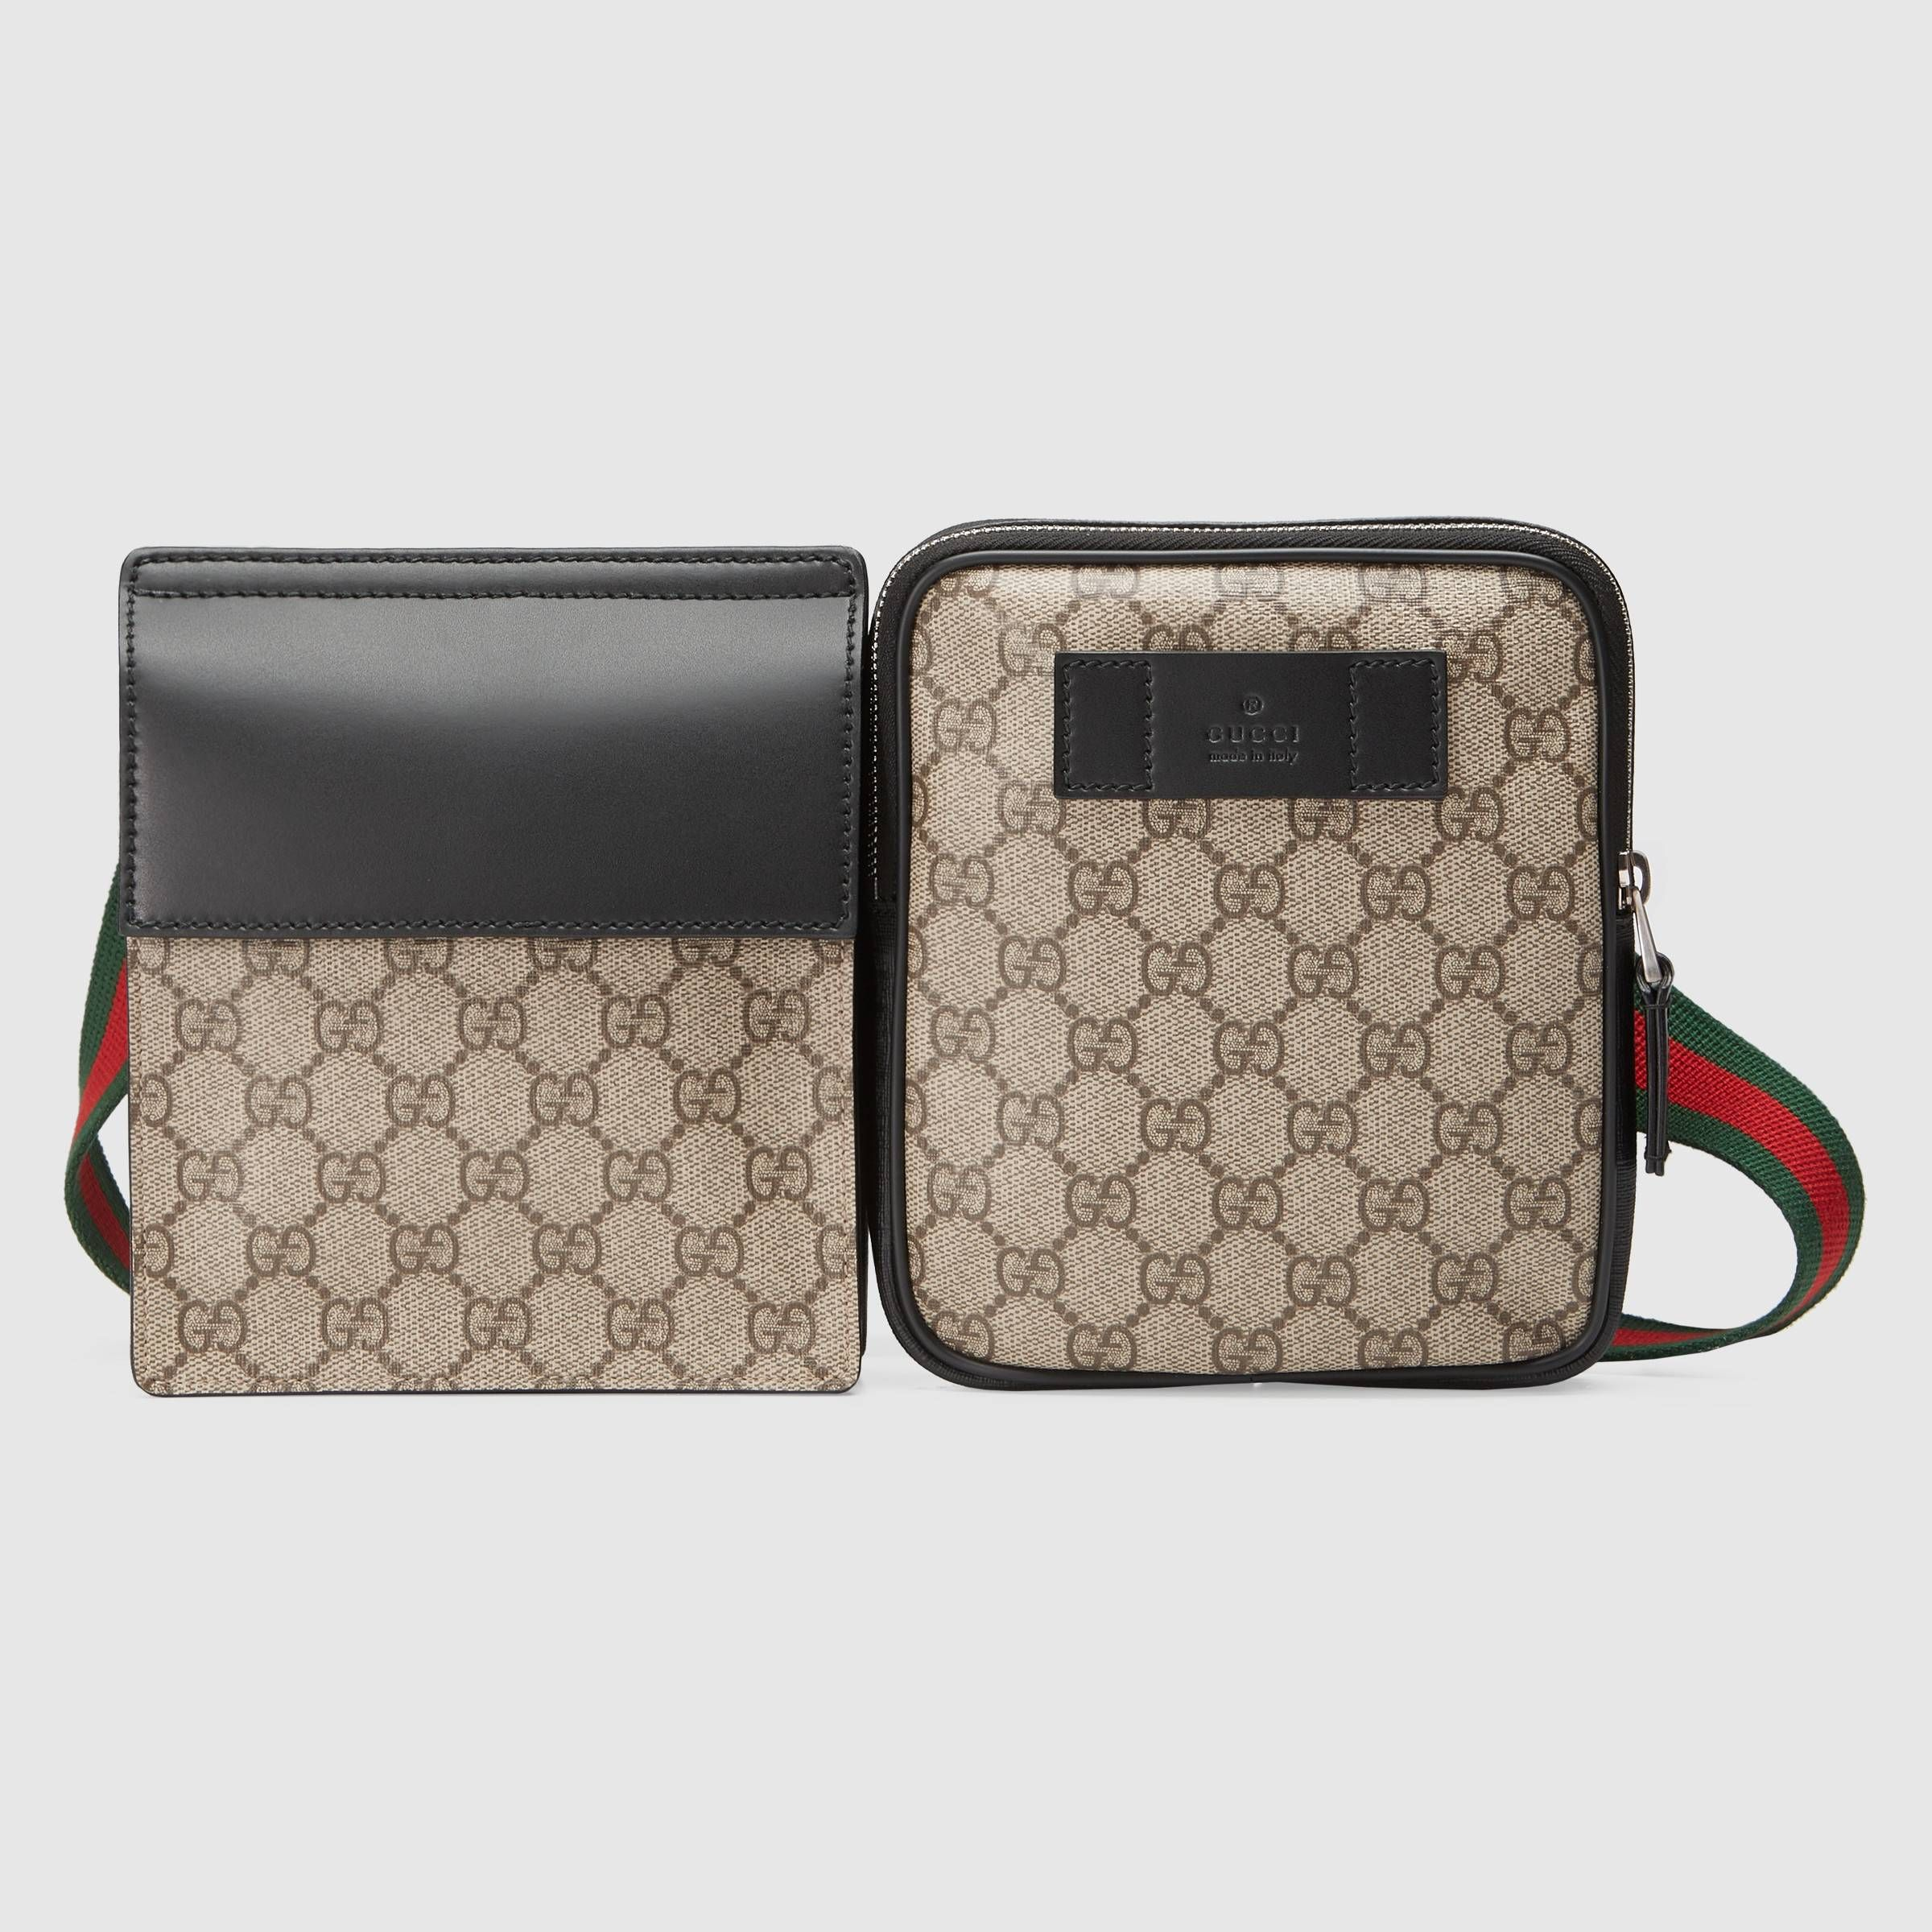 786ad8623763 GG Supreme belt bag - Gucci Women's Luggage & Lifestyle Bags 450956K6RHX9678